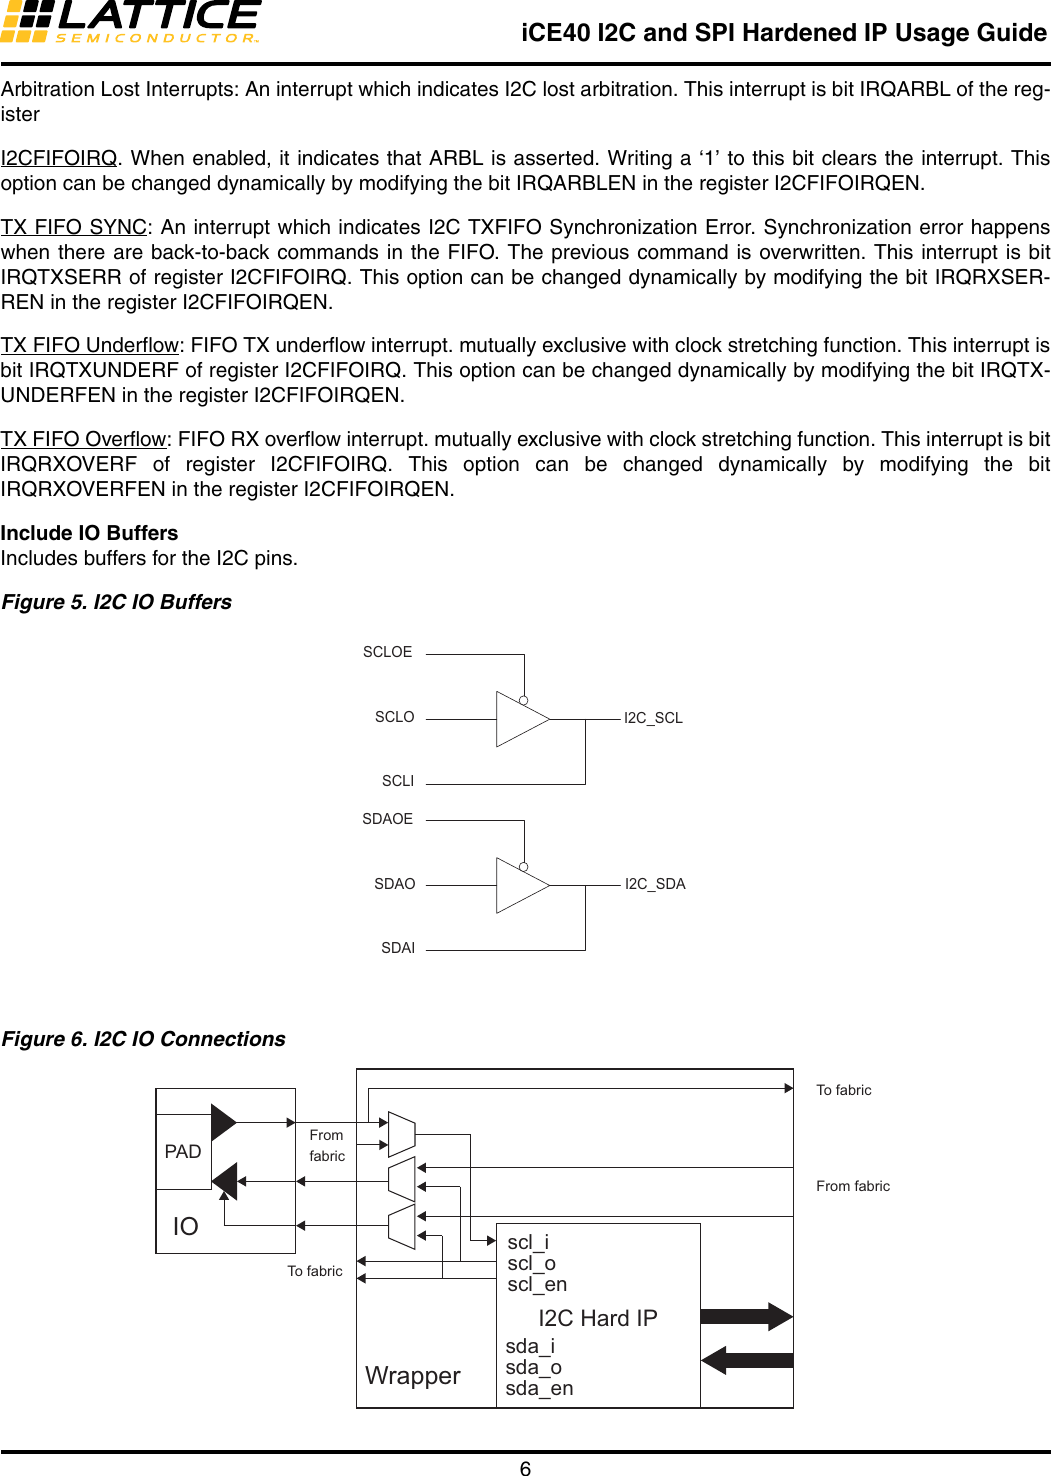 TN1274 ICE40 I2C And SPI Hardened IP Usage Guide I